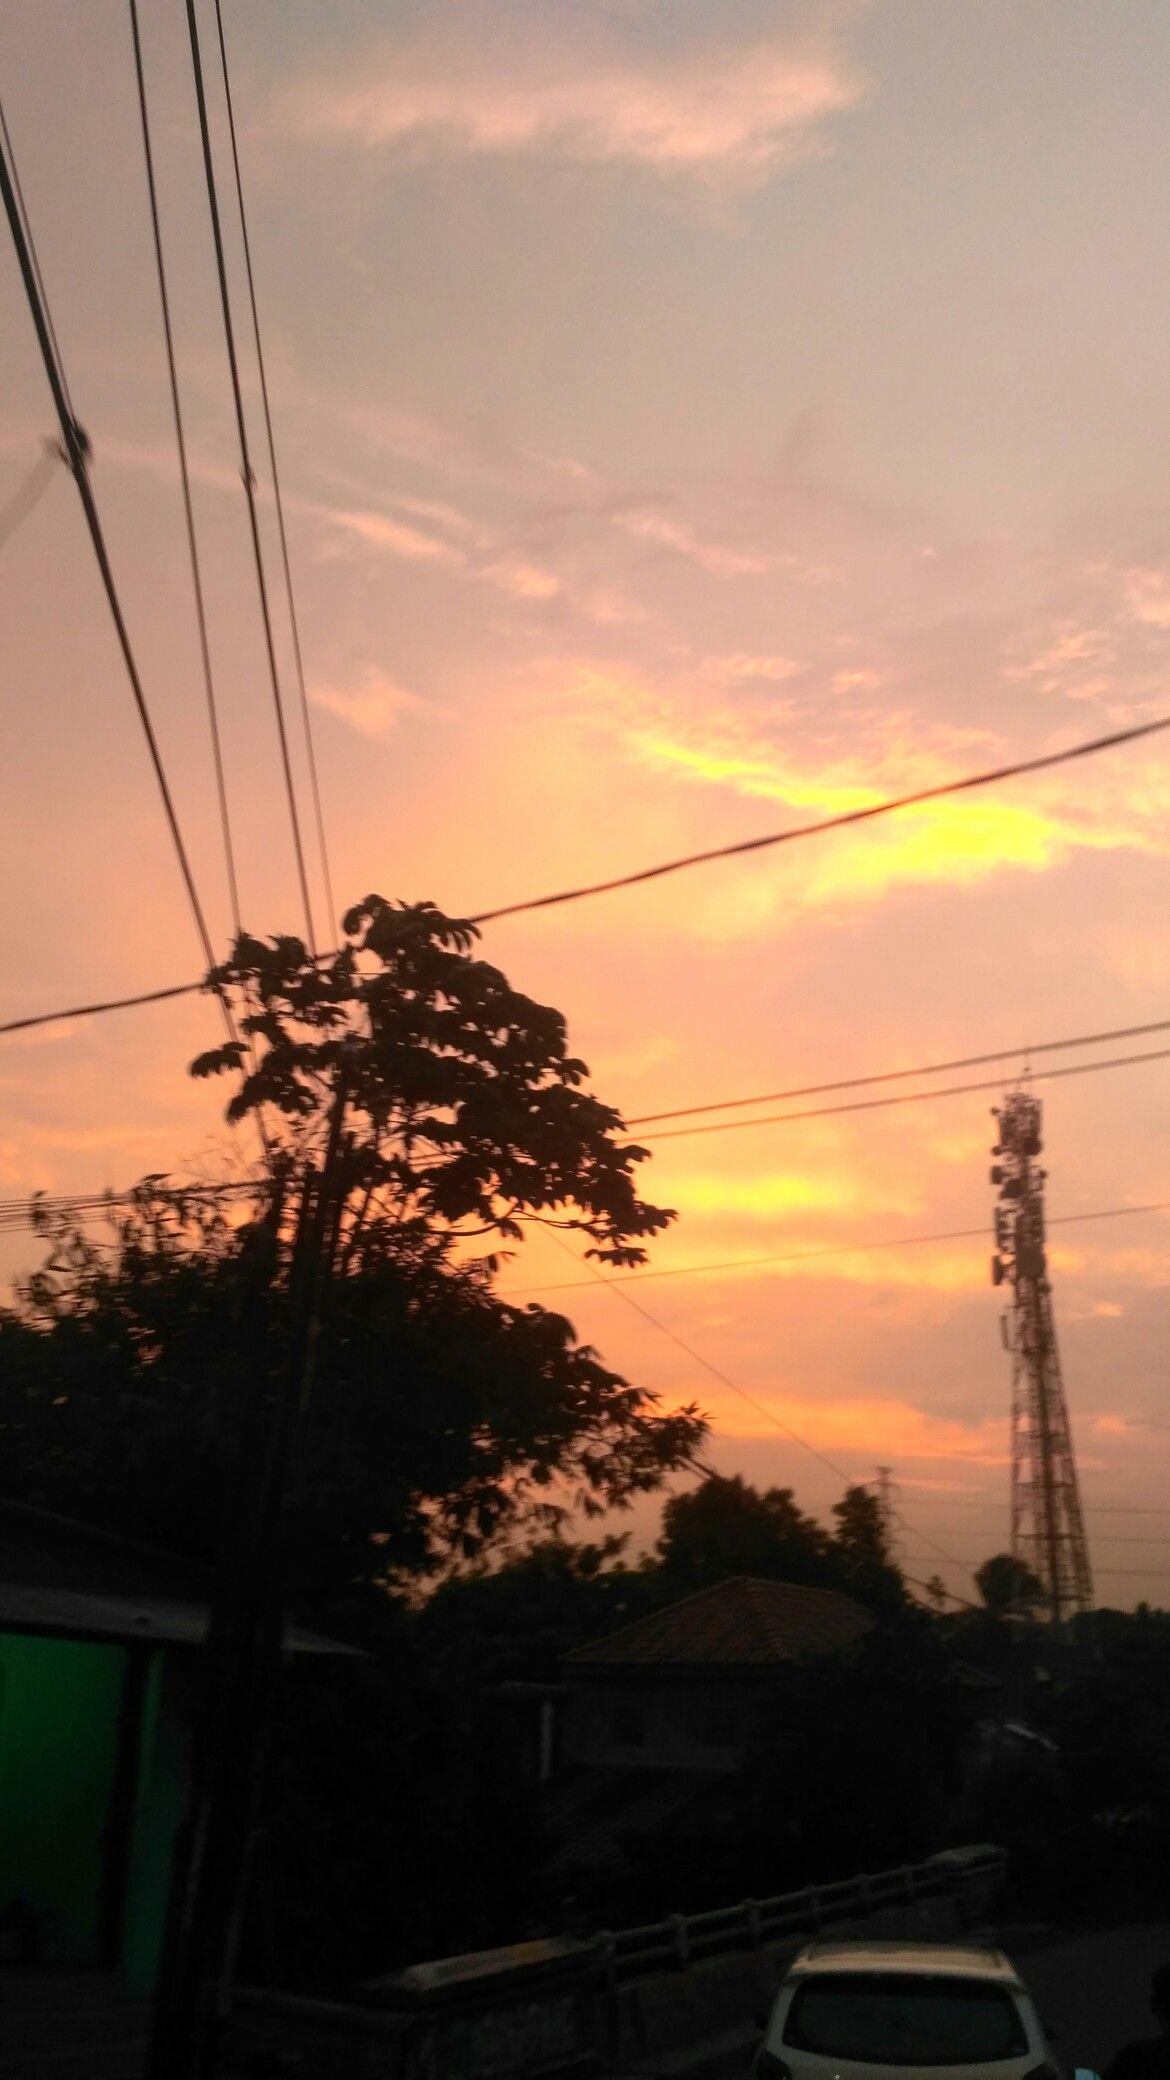 Sunset Pemandangan Fotografi Alam Pemandangan Khayalan